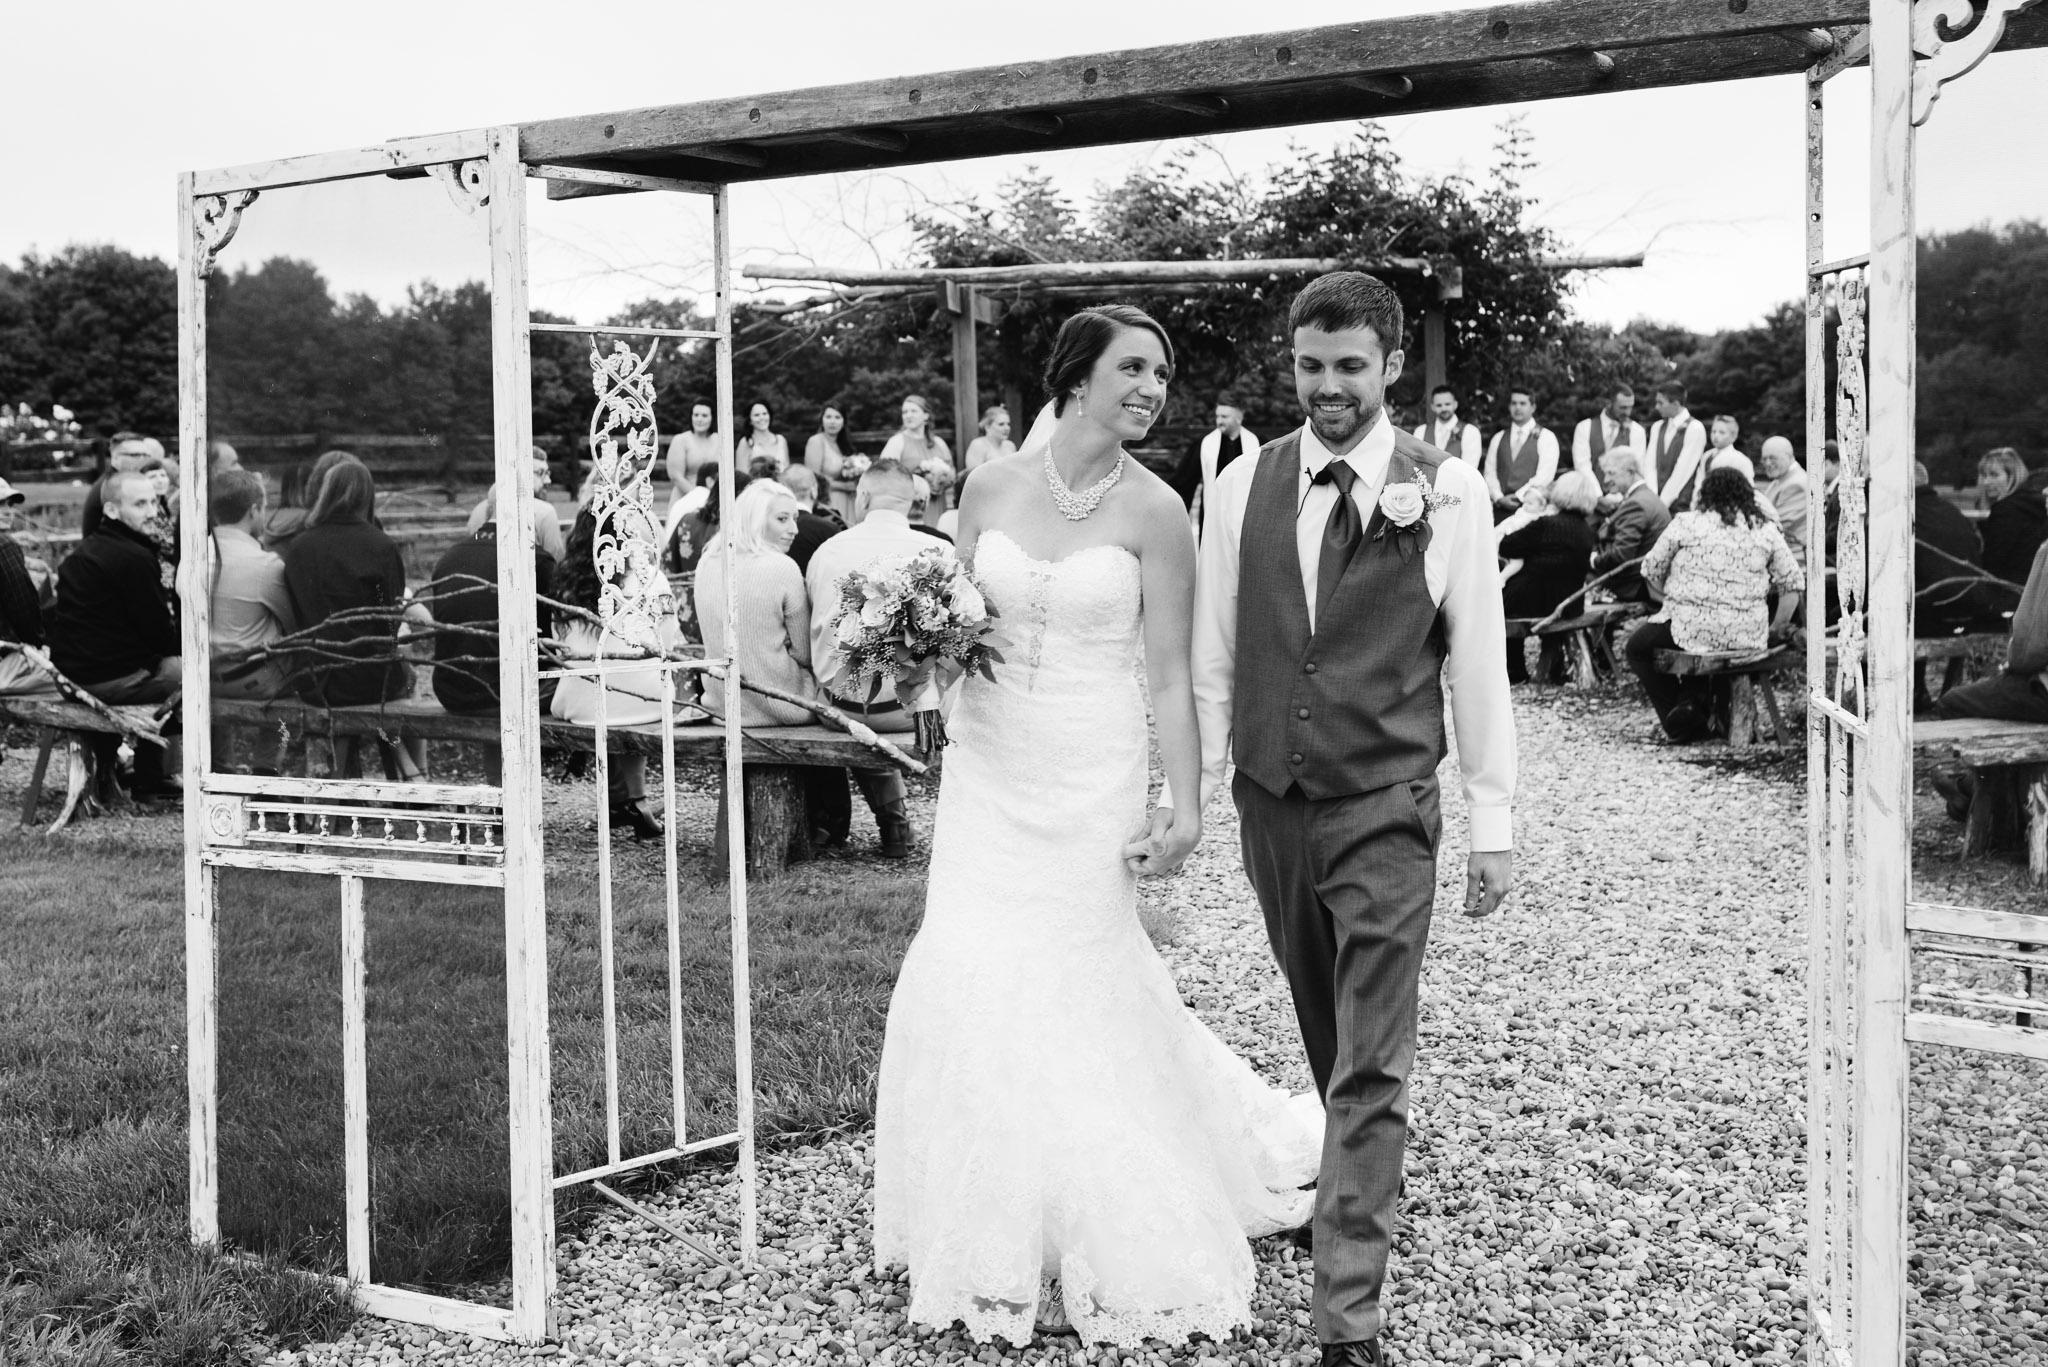 mariah fisher wedding and portrait photographer the hayloft of pa wedding.jpg